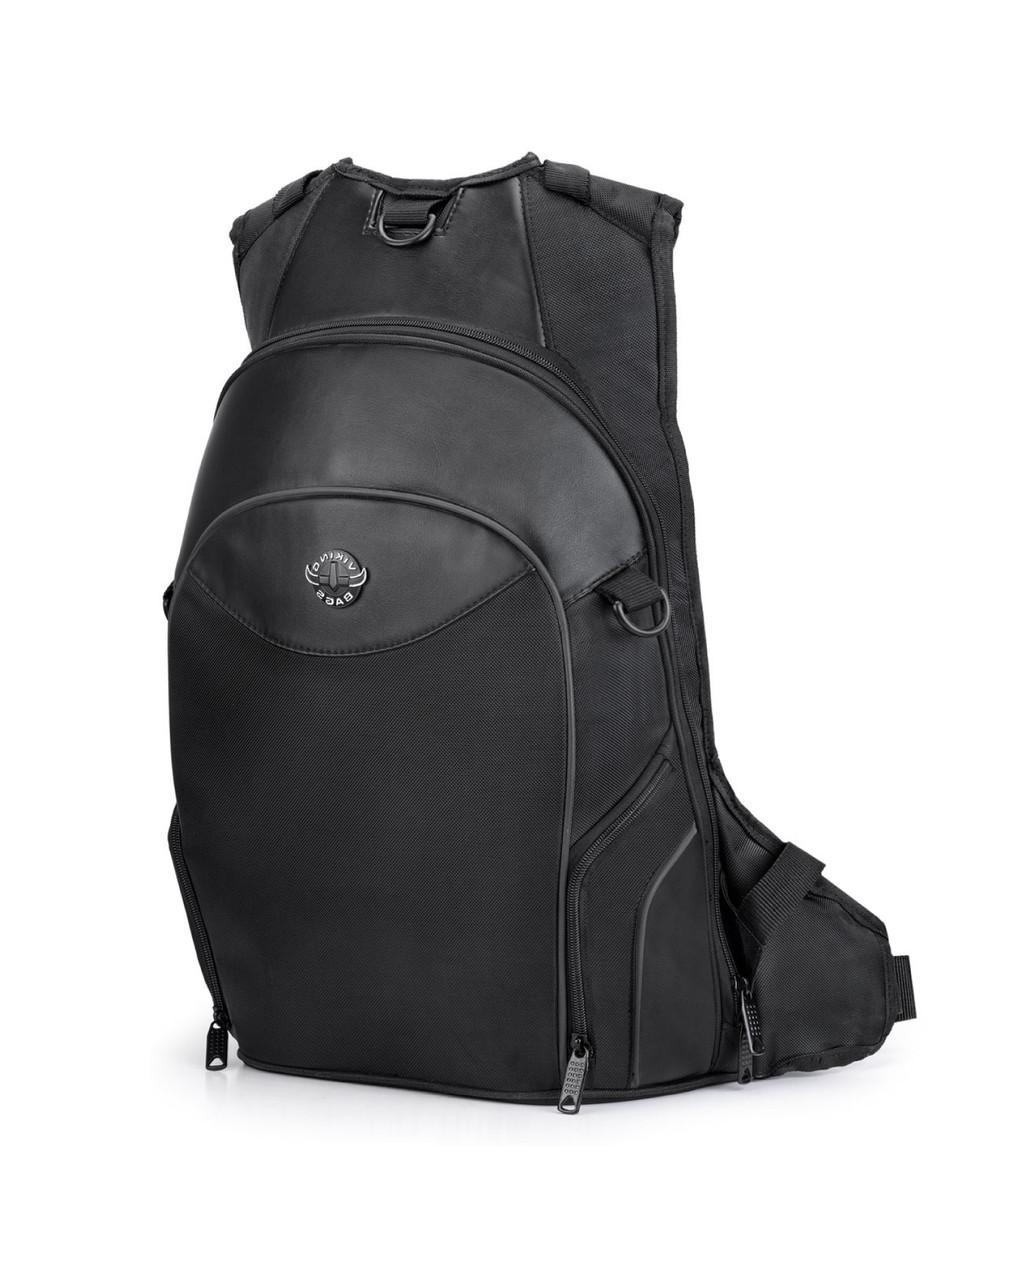 Viking Medium Black Backpack For Harley Davidson Main Bag View